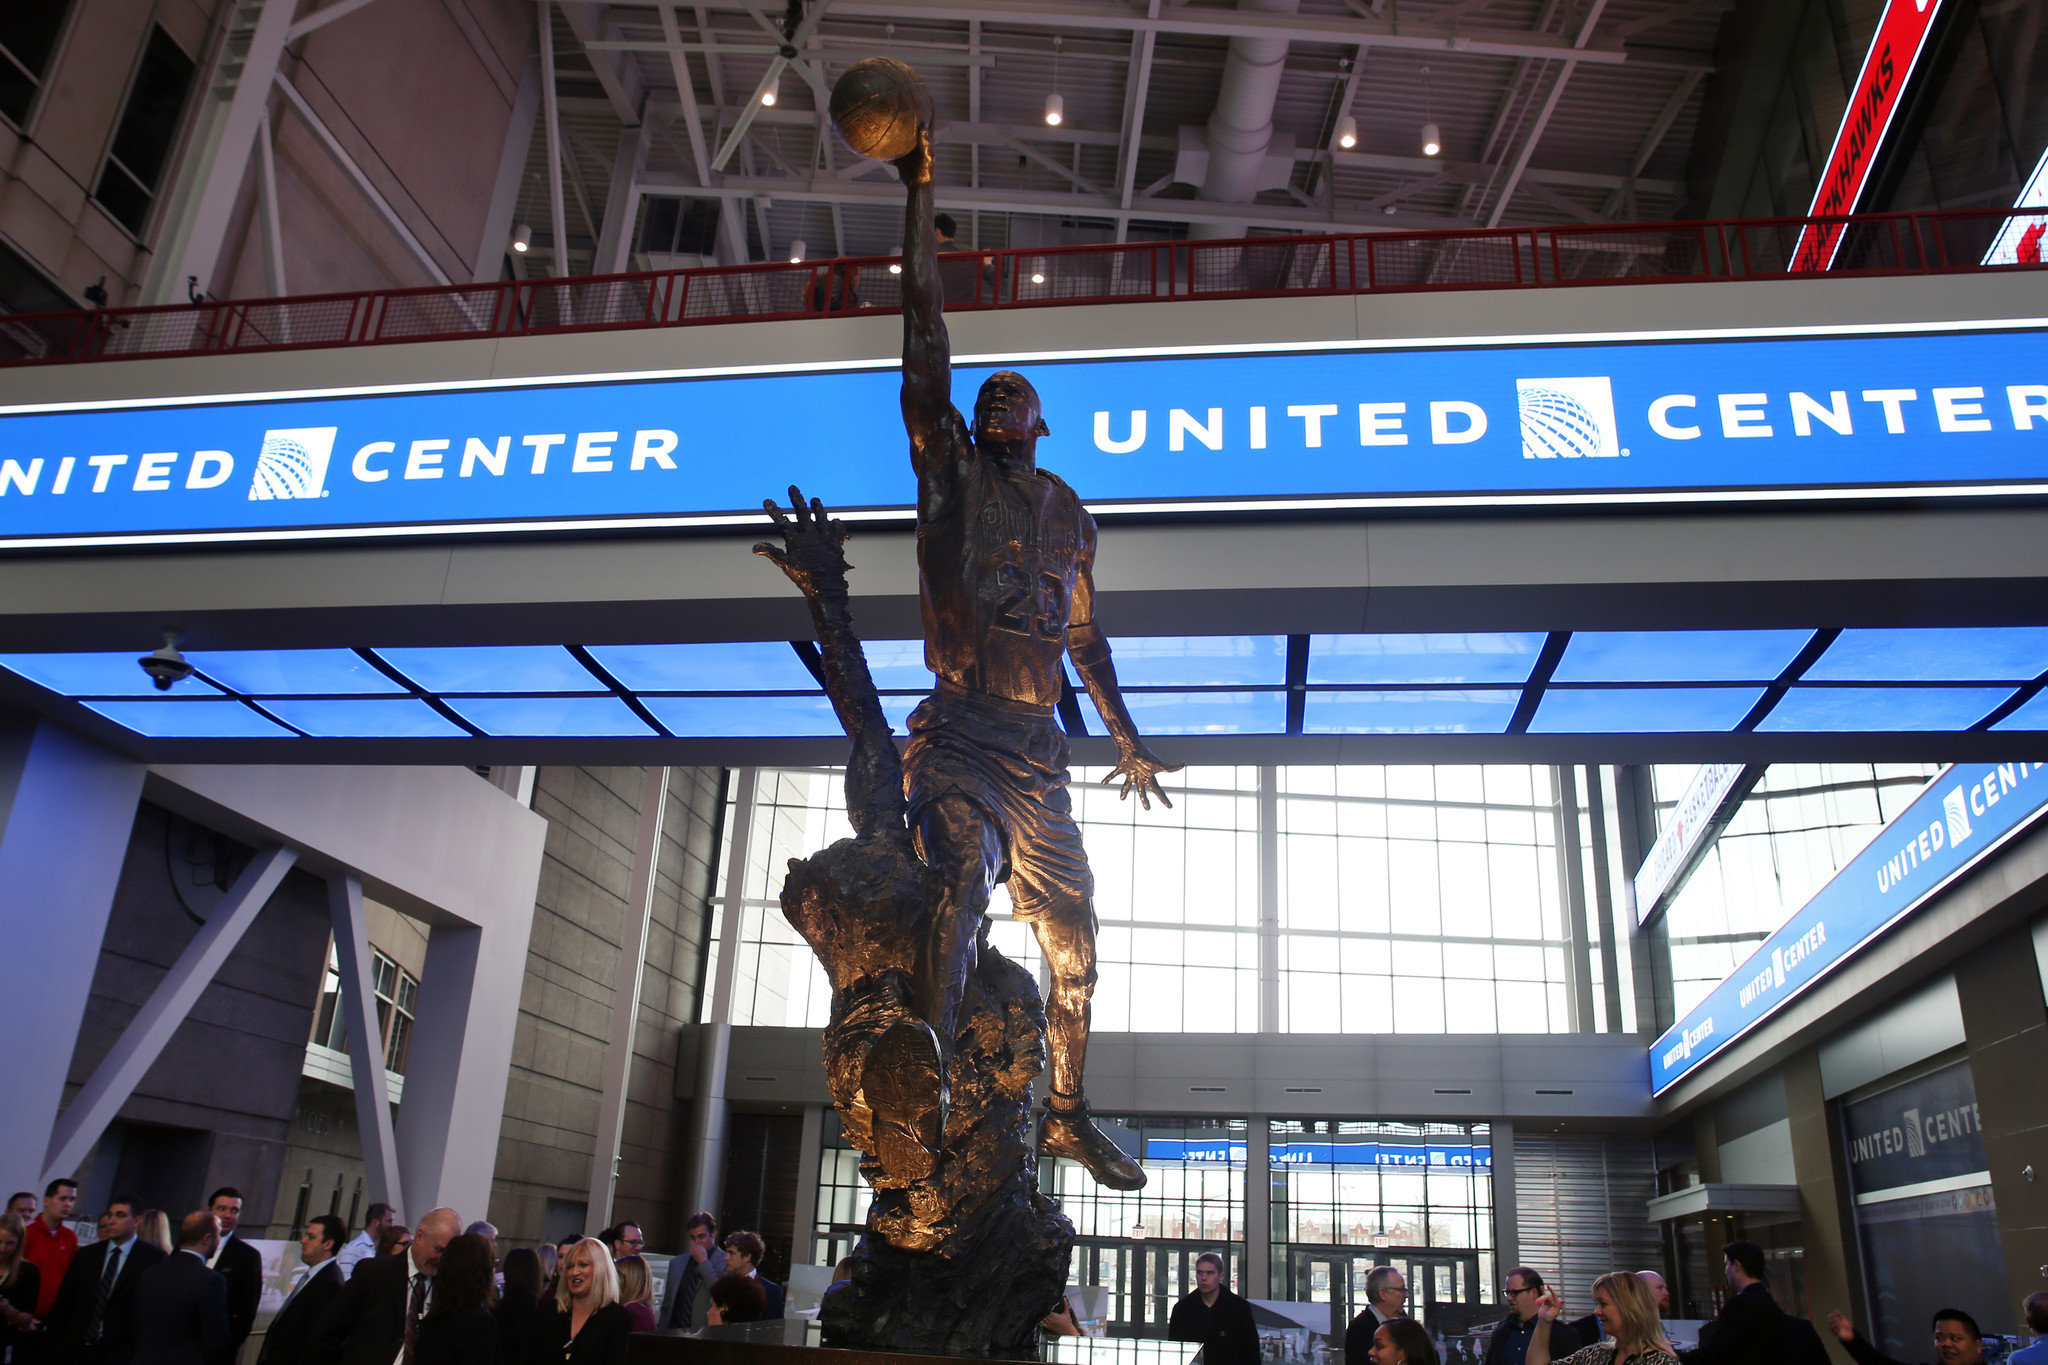 Exterior: Michael Jordan Statue Centerpiece Of United Center's East